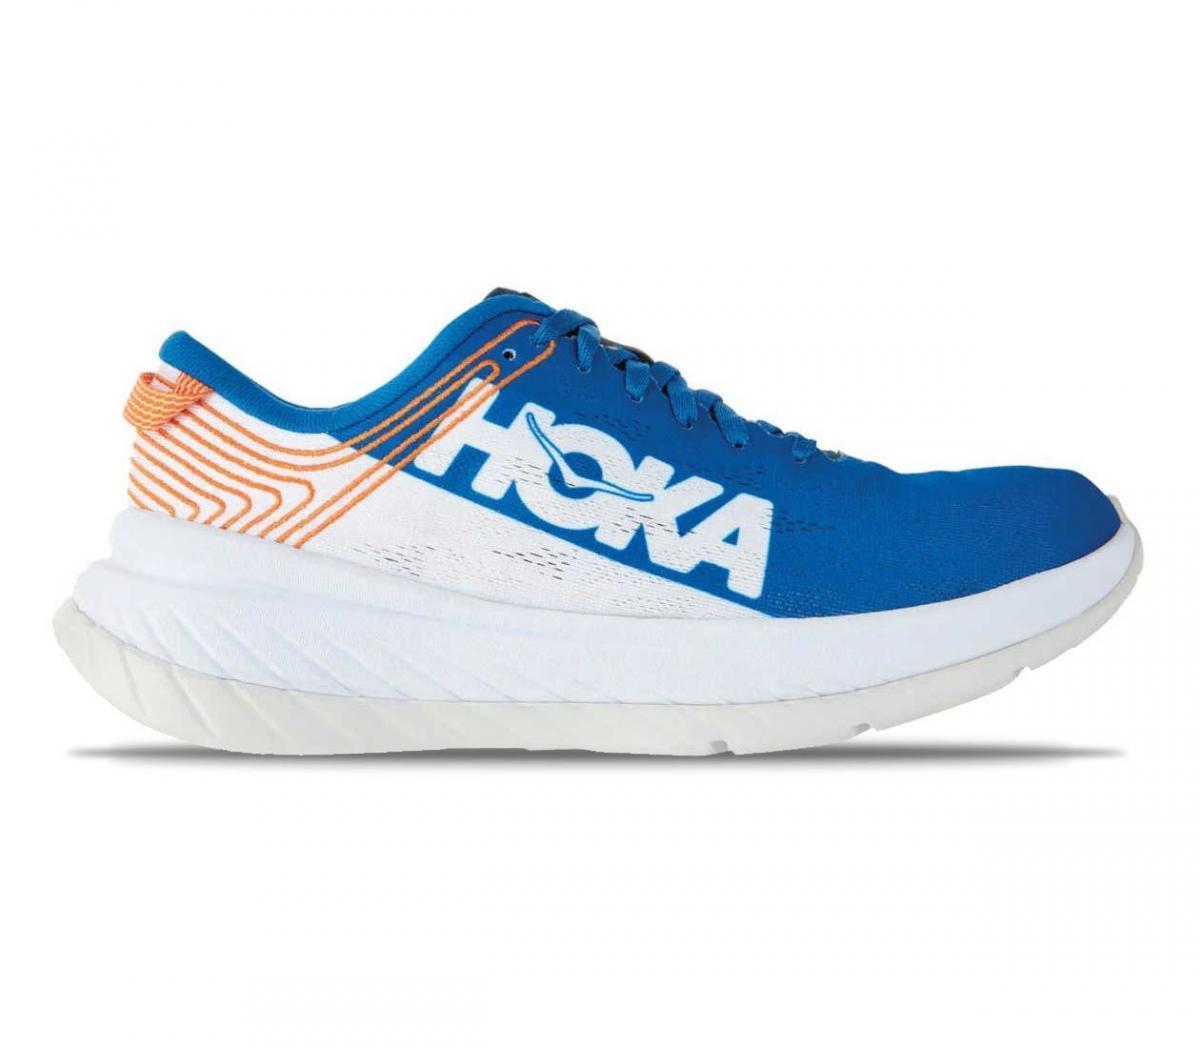 hoka one one carbon x ibwt scarpa running uomo